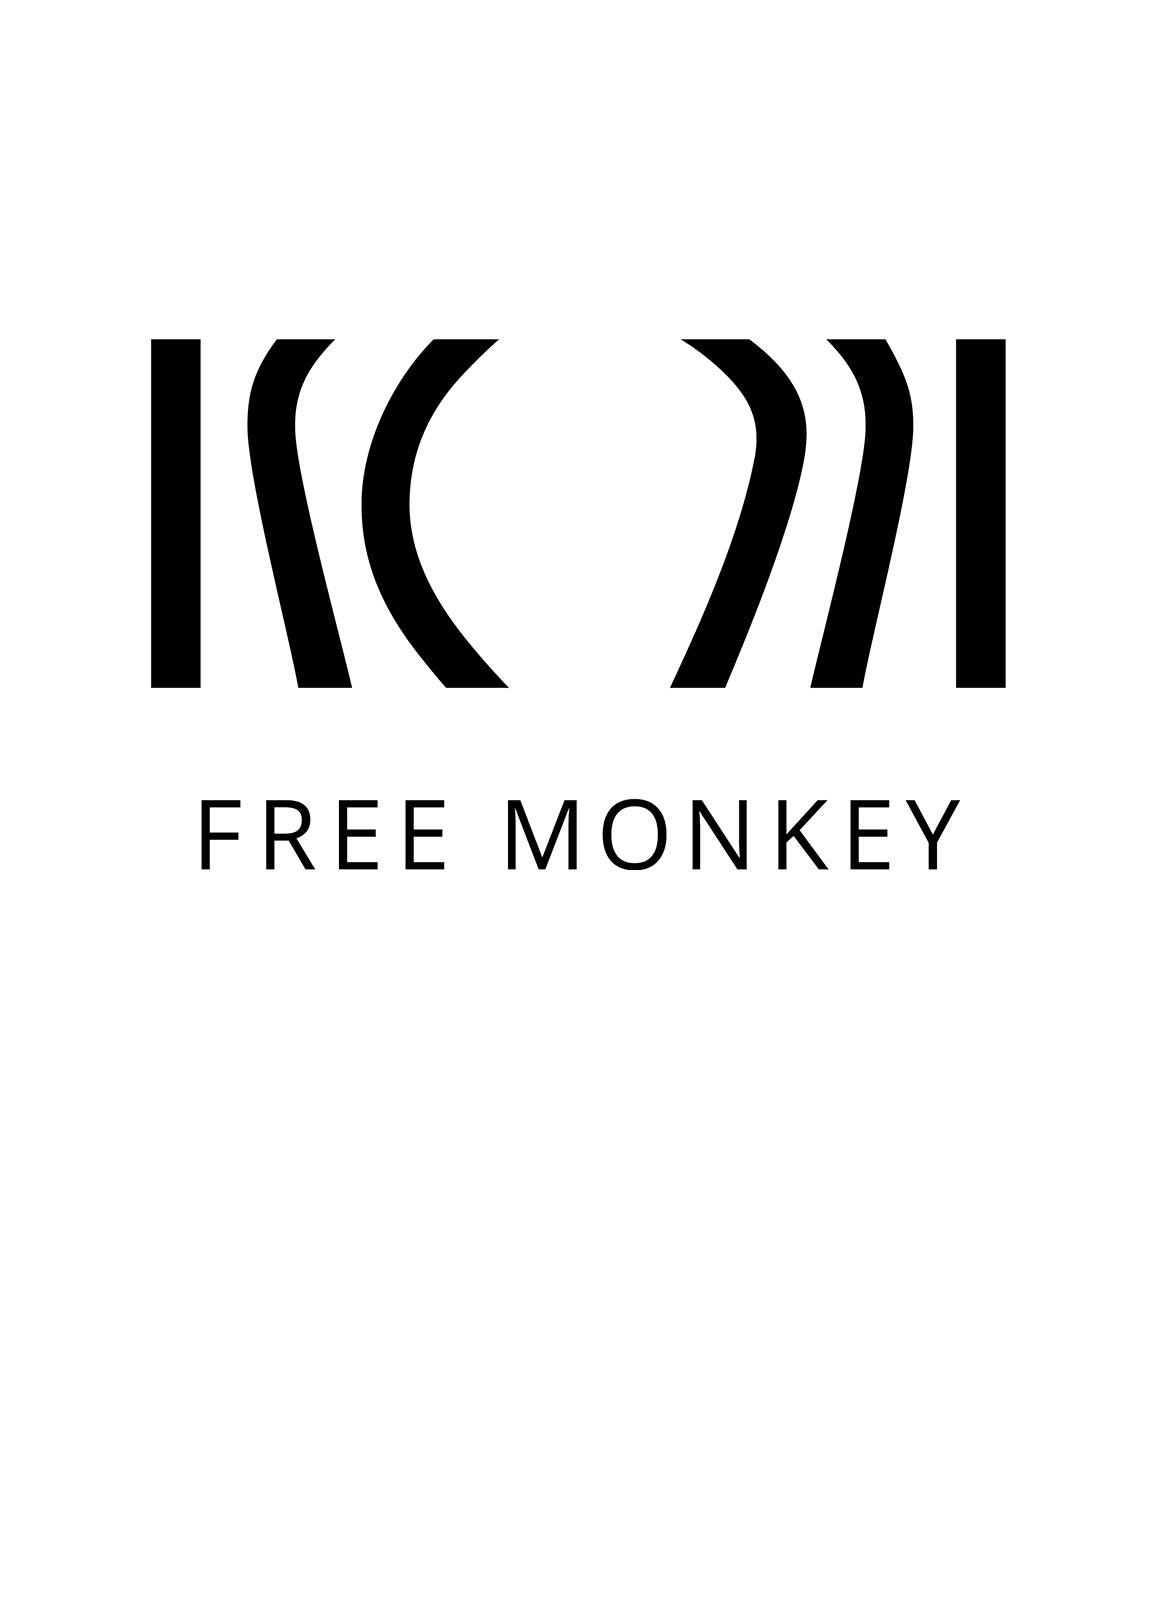 Free Monkey Logo